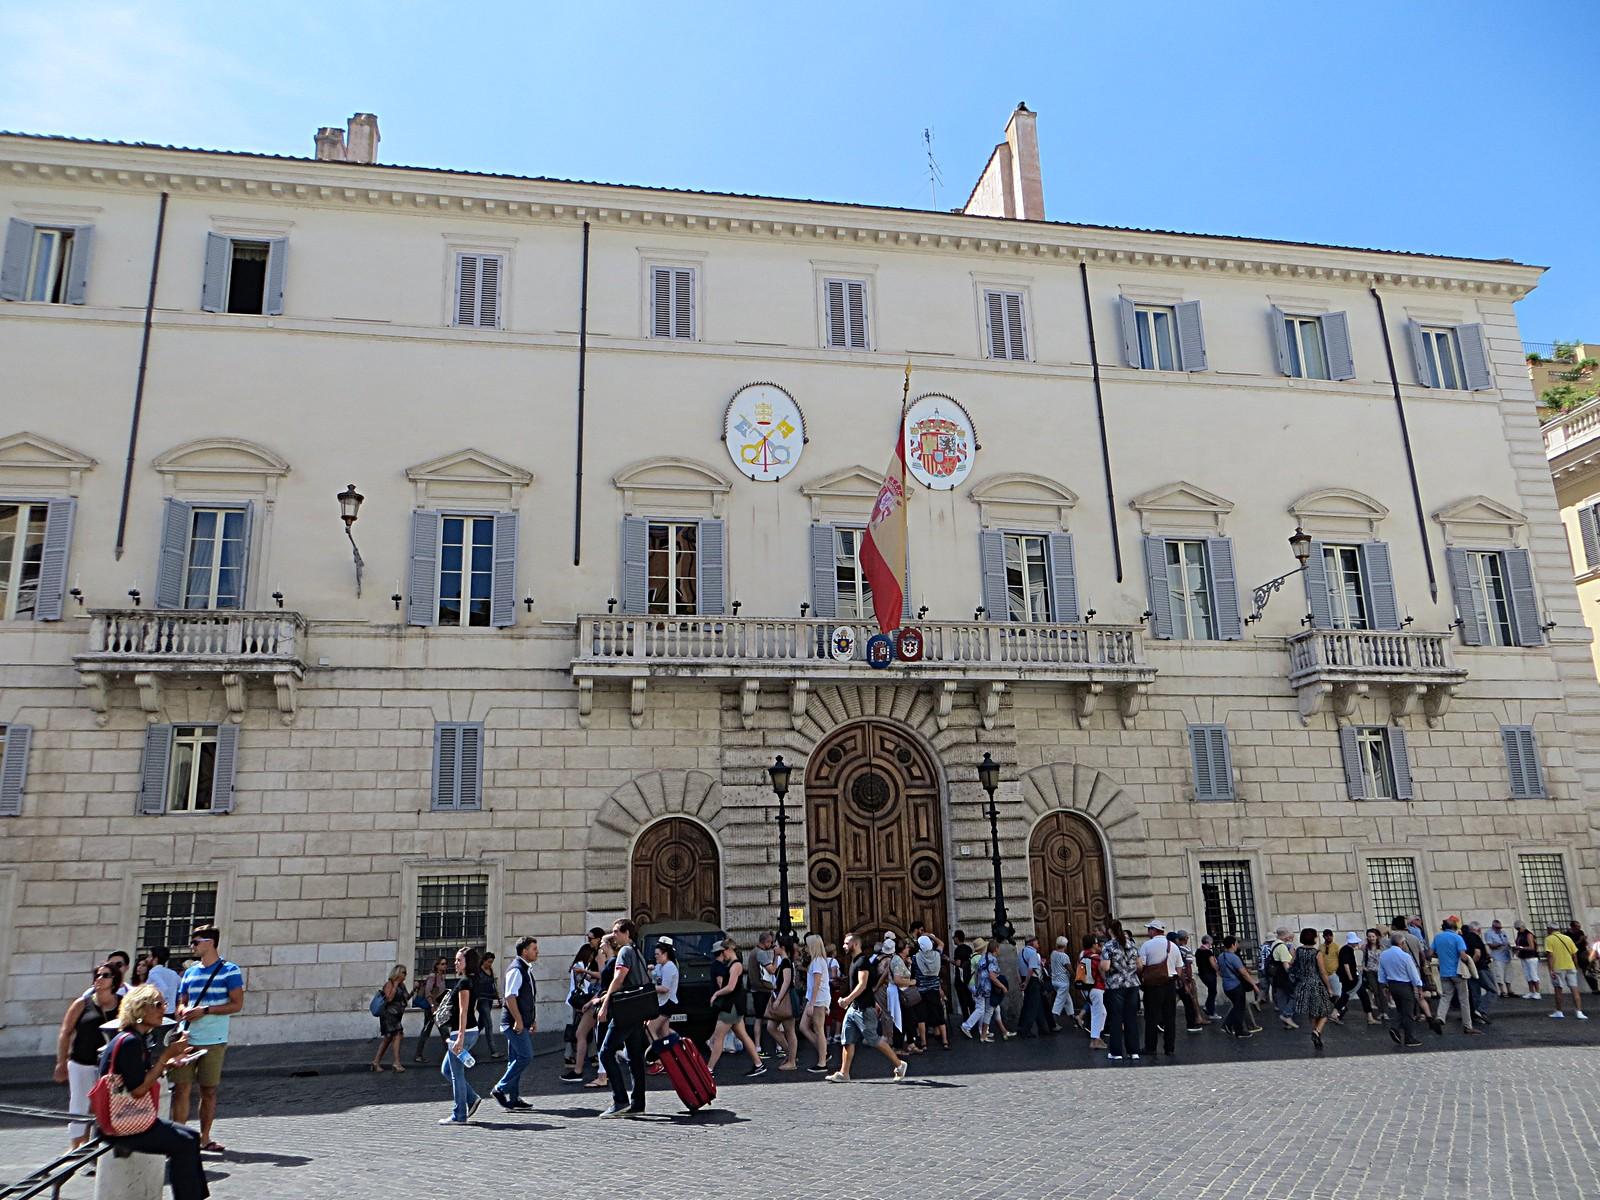 A Spanyol Palota (Forrás: www.wikimedia.org/wikipedia/commons/f/ff/Ambasciata_di_Spagna_Presso_Santa_Sede_-_panoramio.jpg)